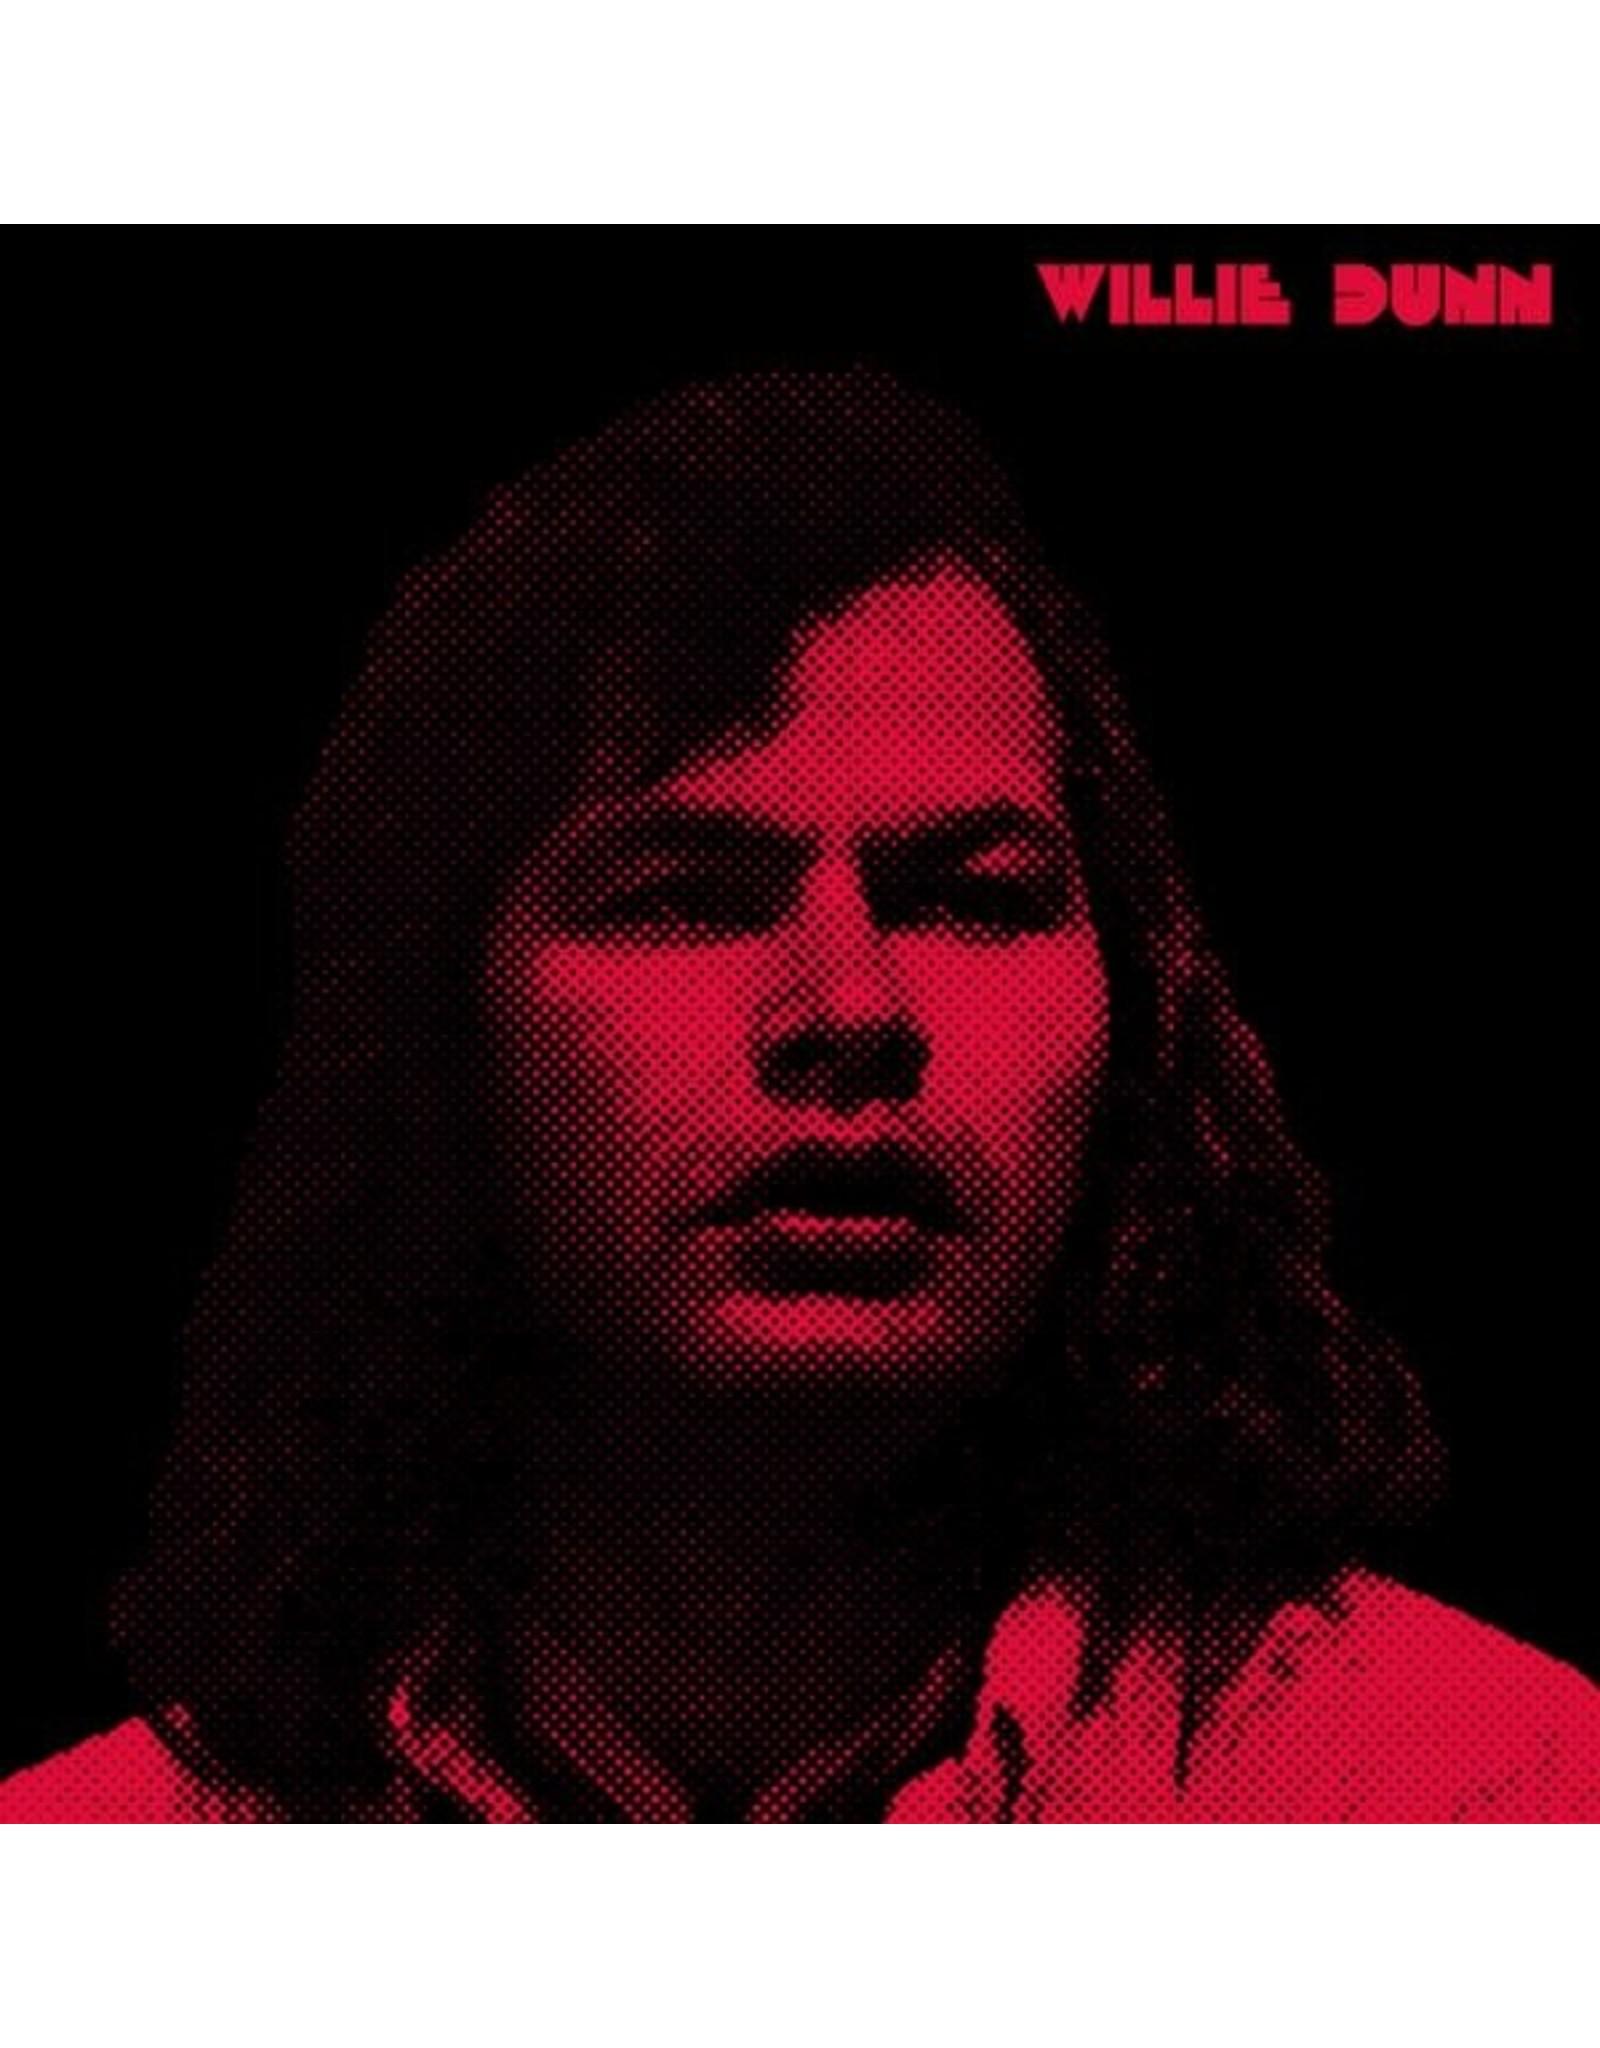 Dunn, Willie - Creation Never Sleeps. Creation Never Dies: The Willie Dunn  Anthology LP